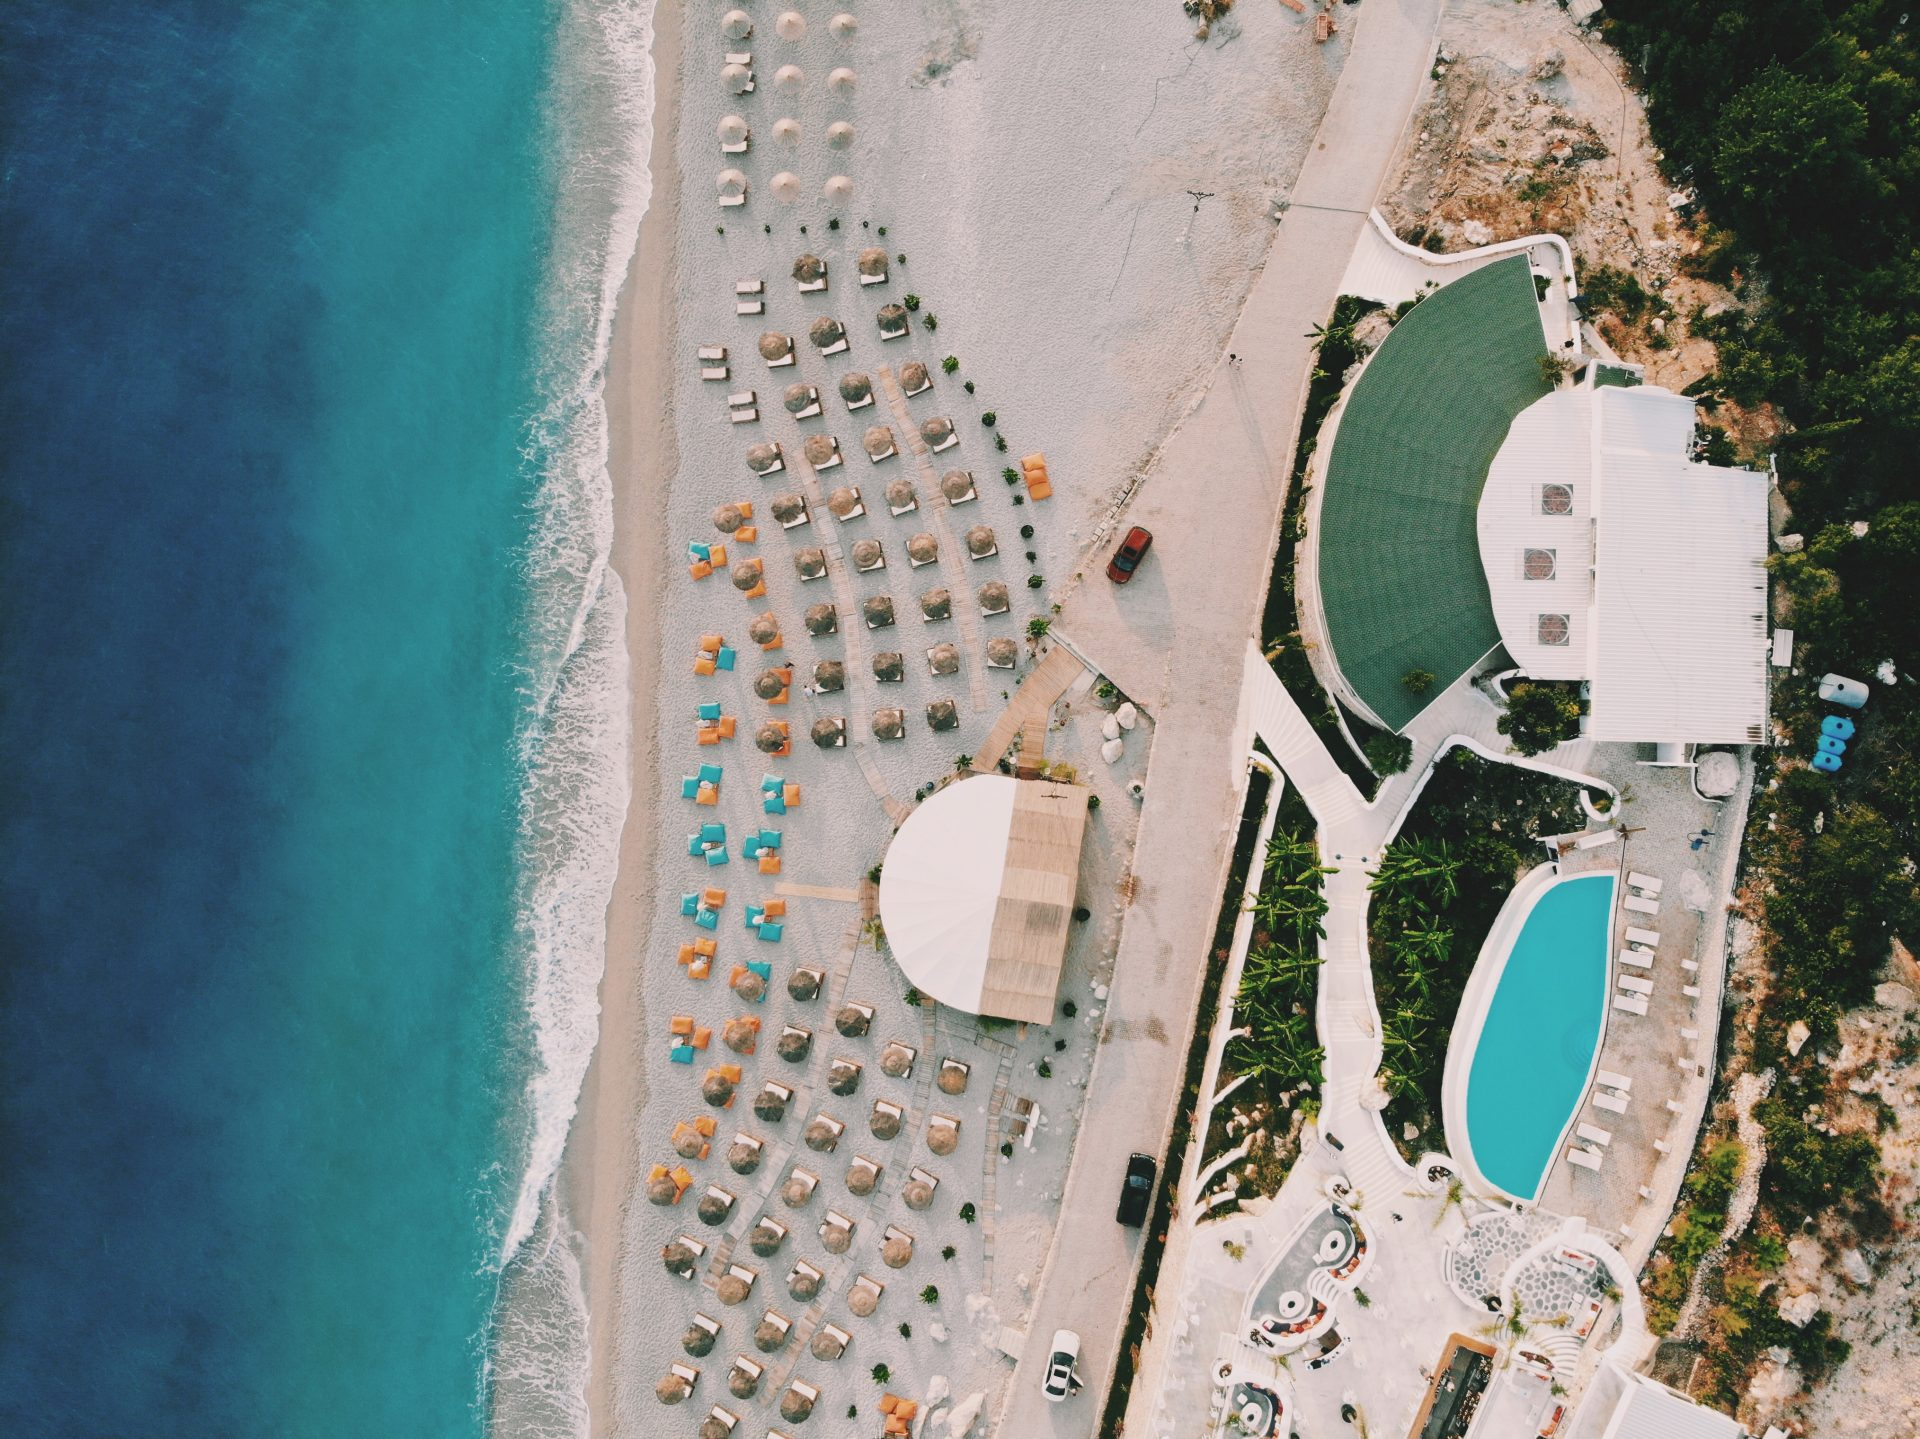 corona en zomervakantie coronapas Solon Travel reisadvies